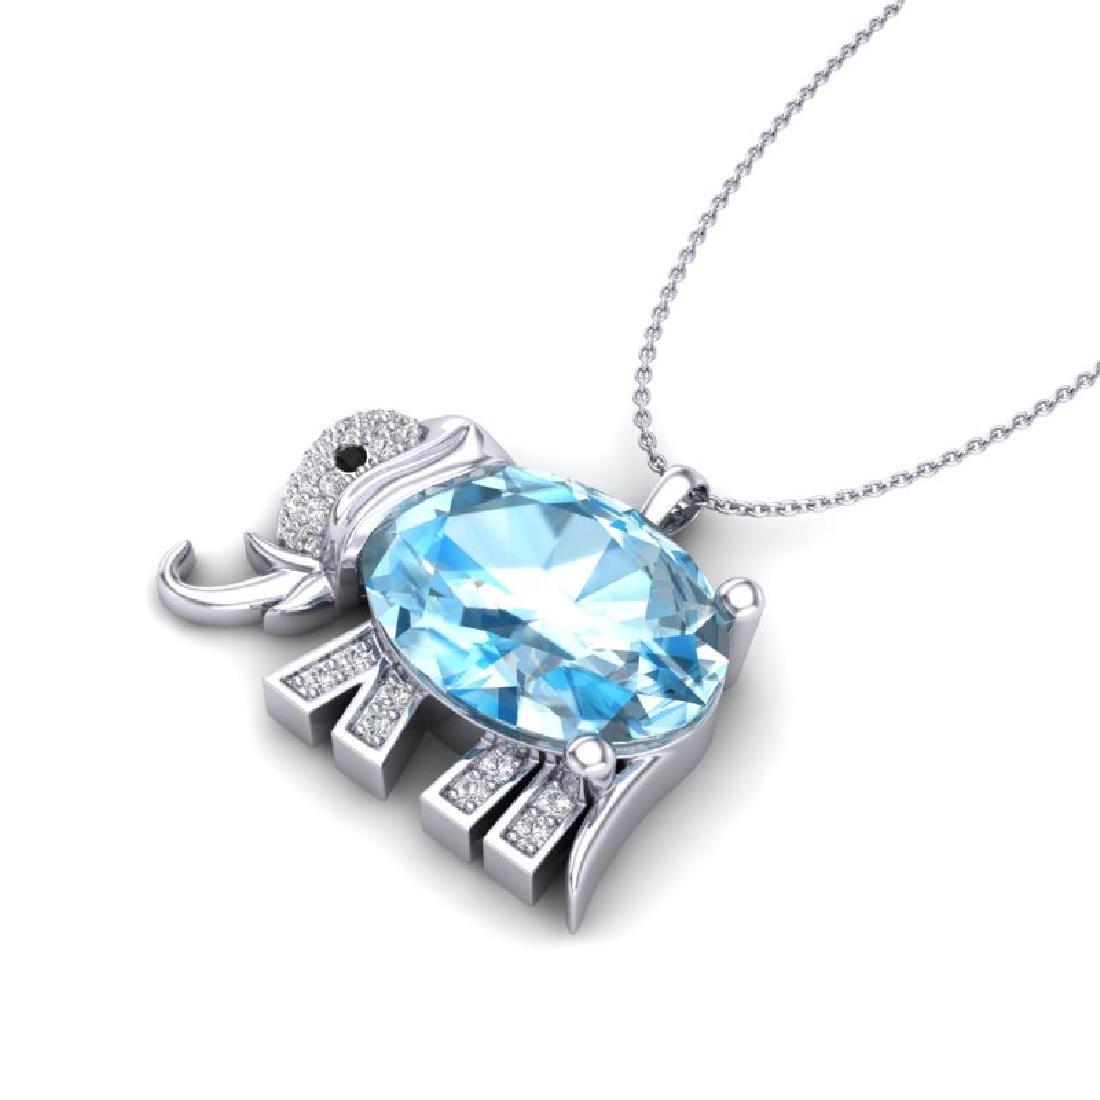 8 CTW Sky Blue Topaz & Micro Pave Necklace 10K White